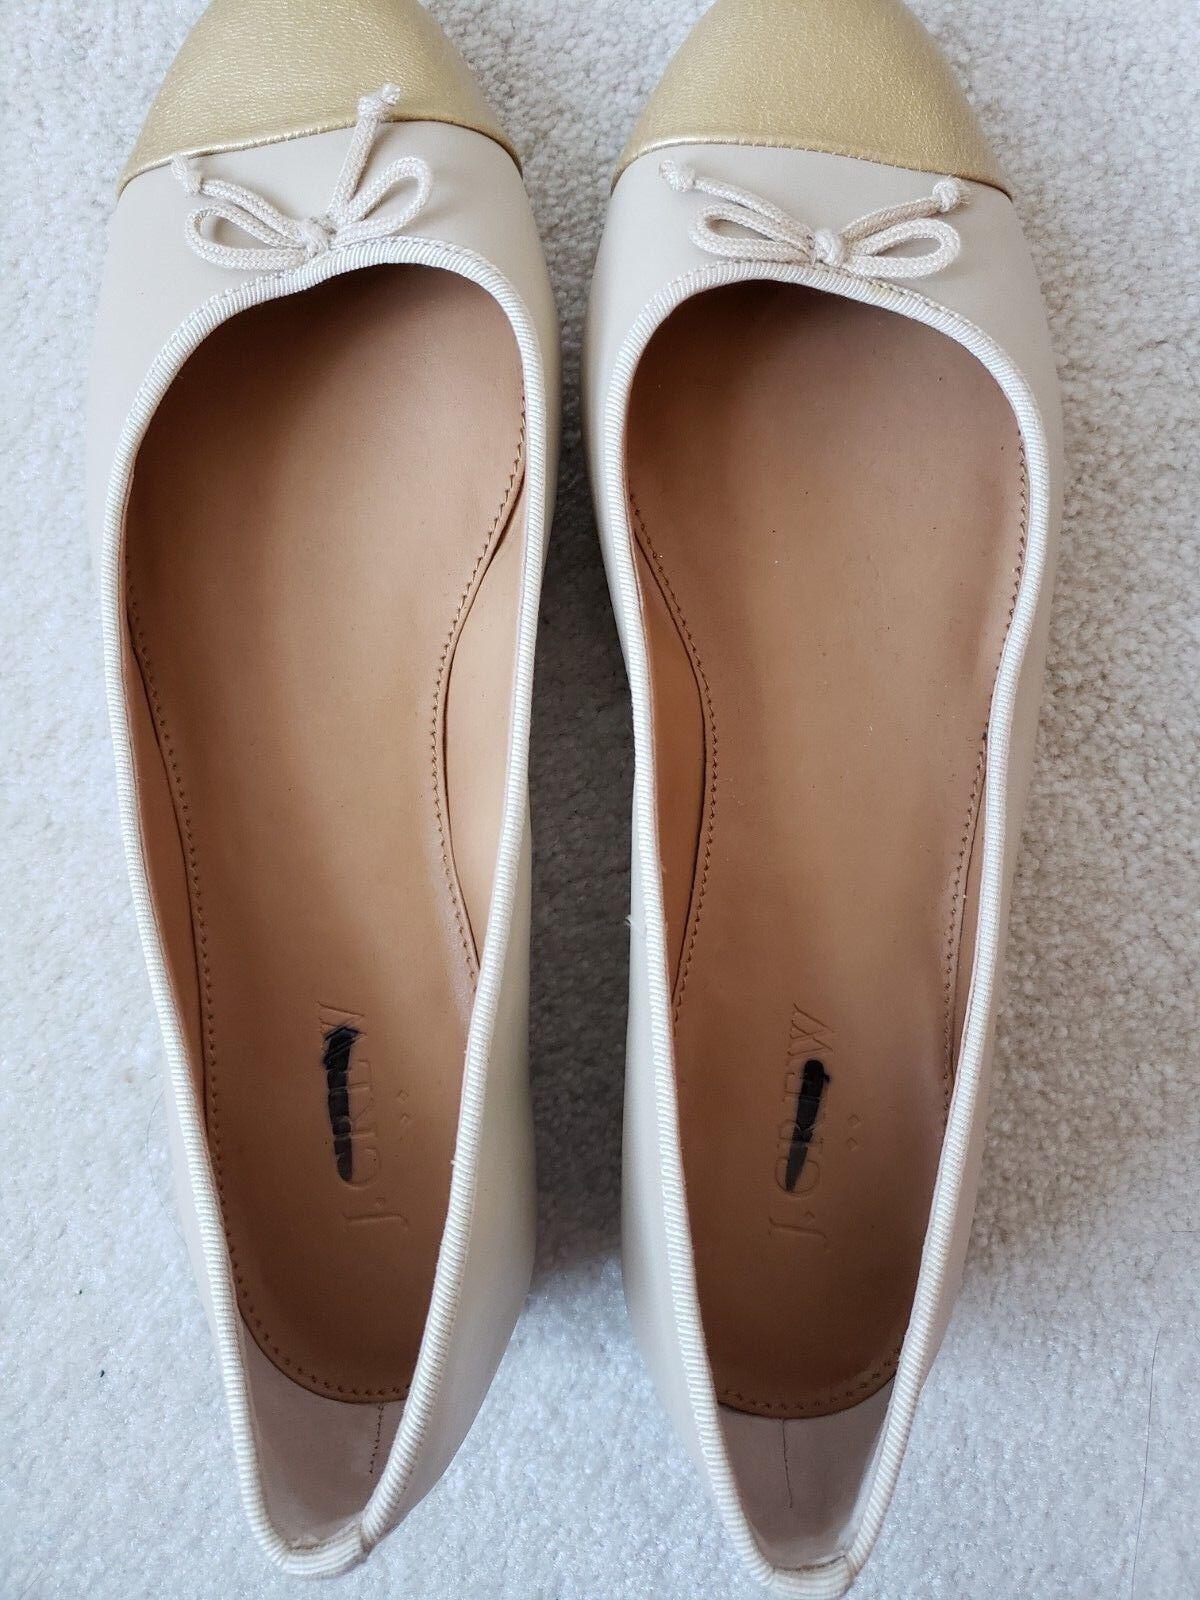 J.Crew Factory uptown cap toe ballet flats Taille 7